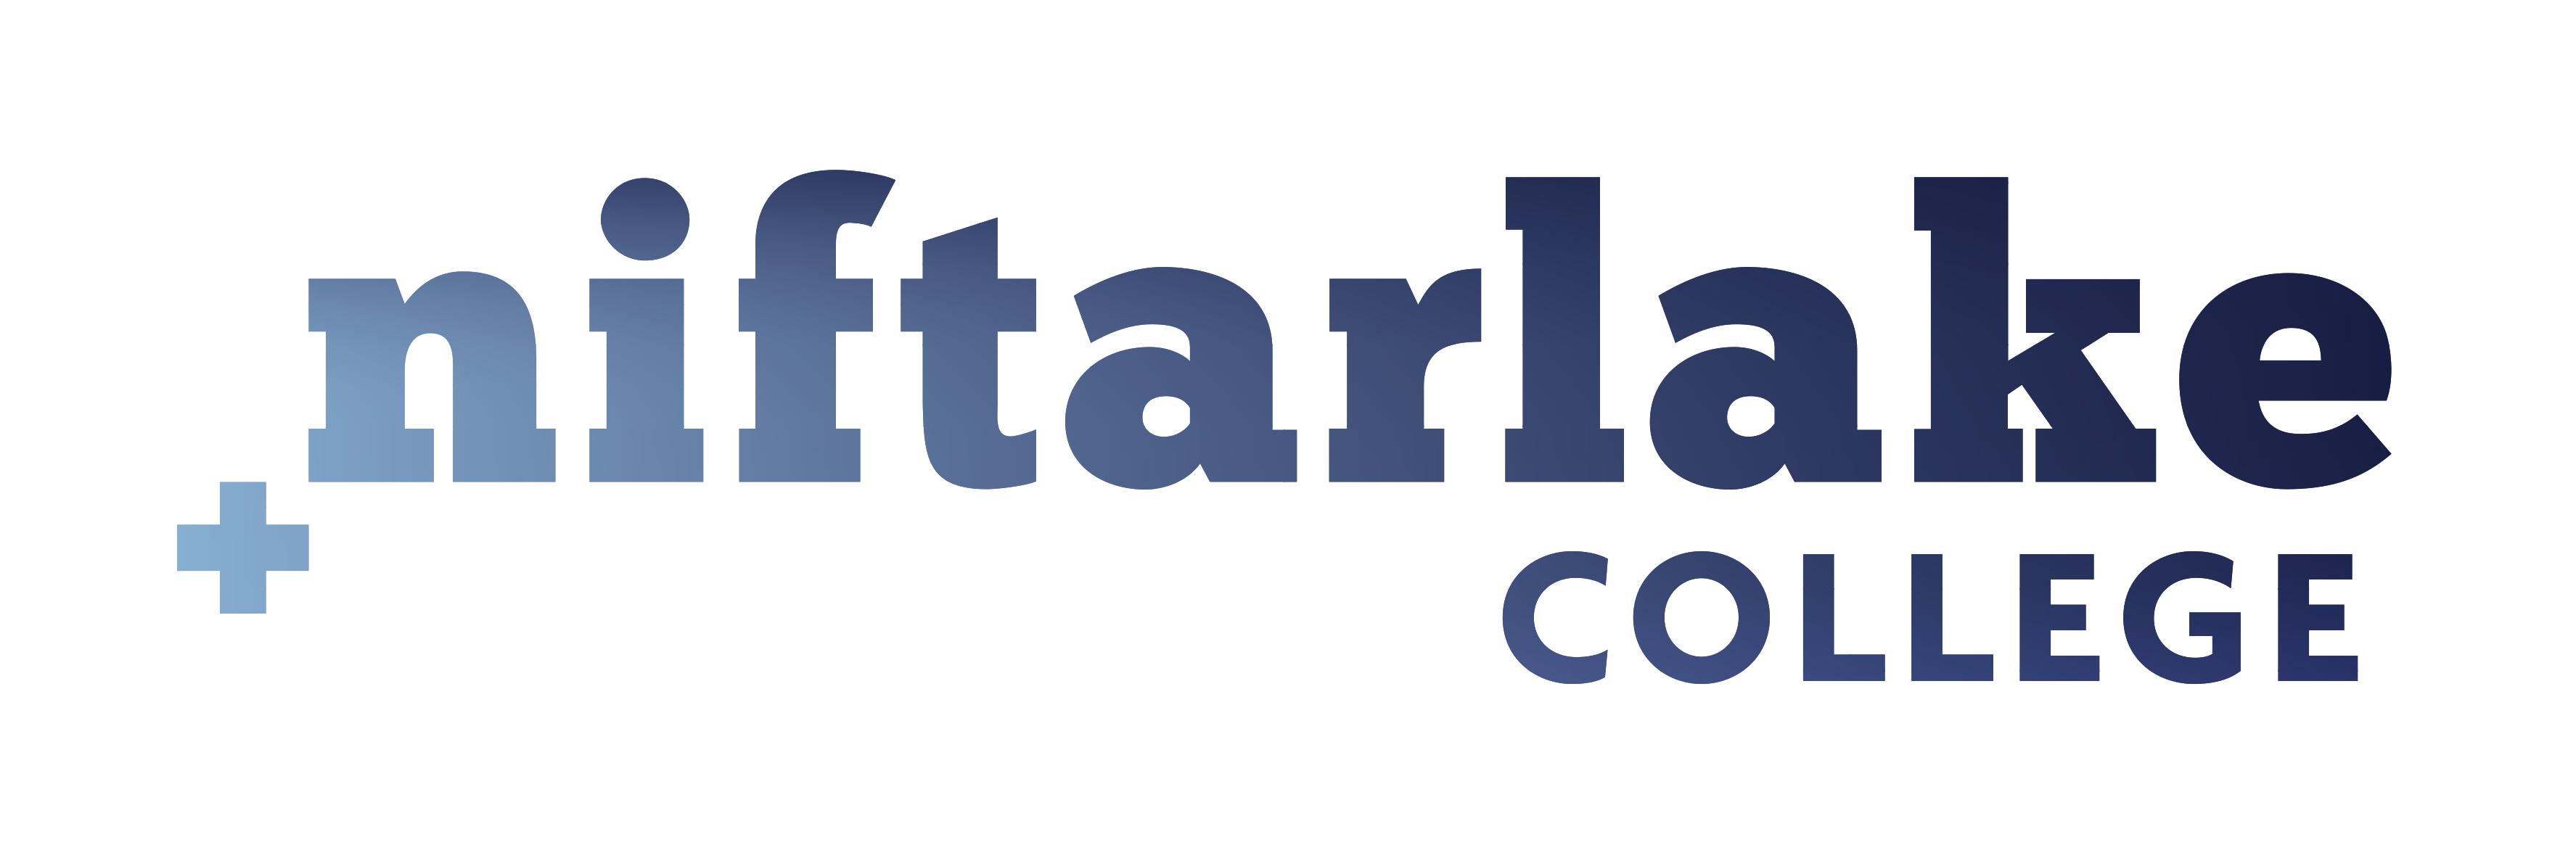 Niftarlake College logo